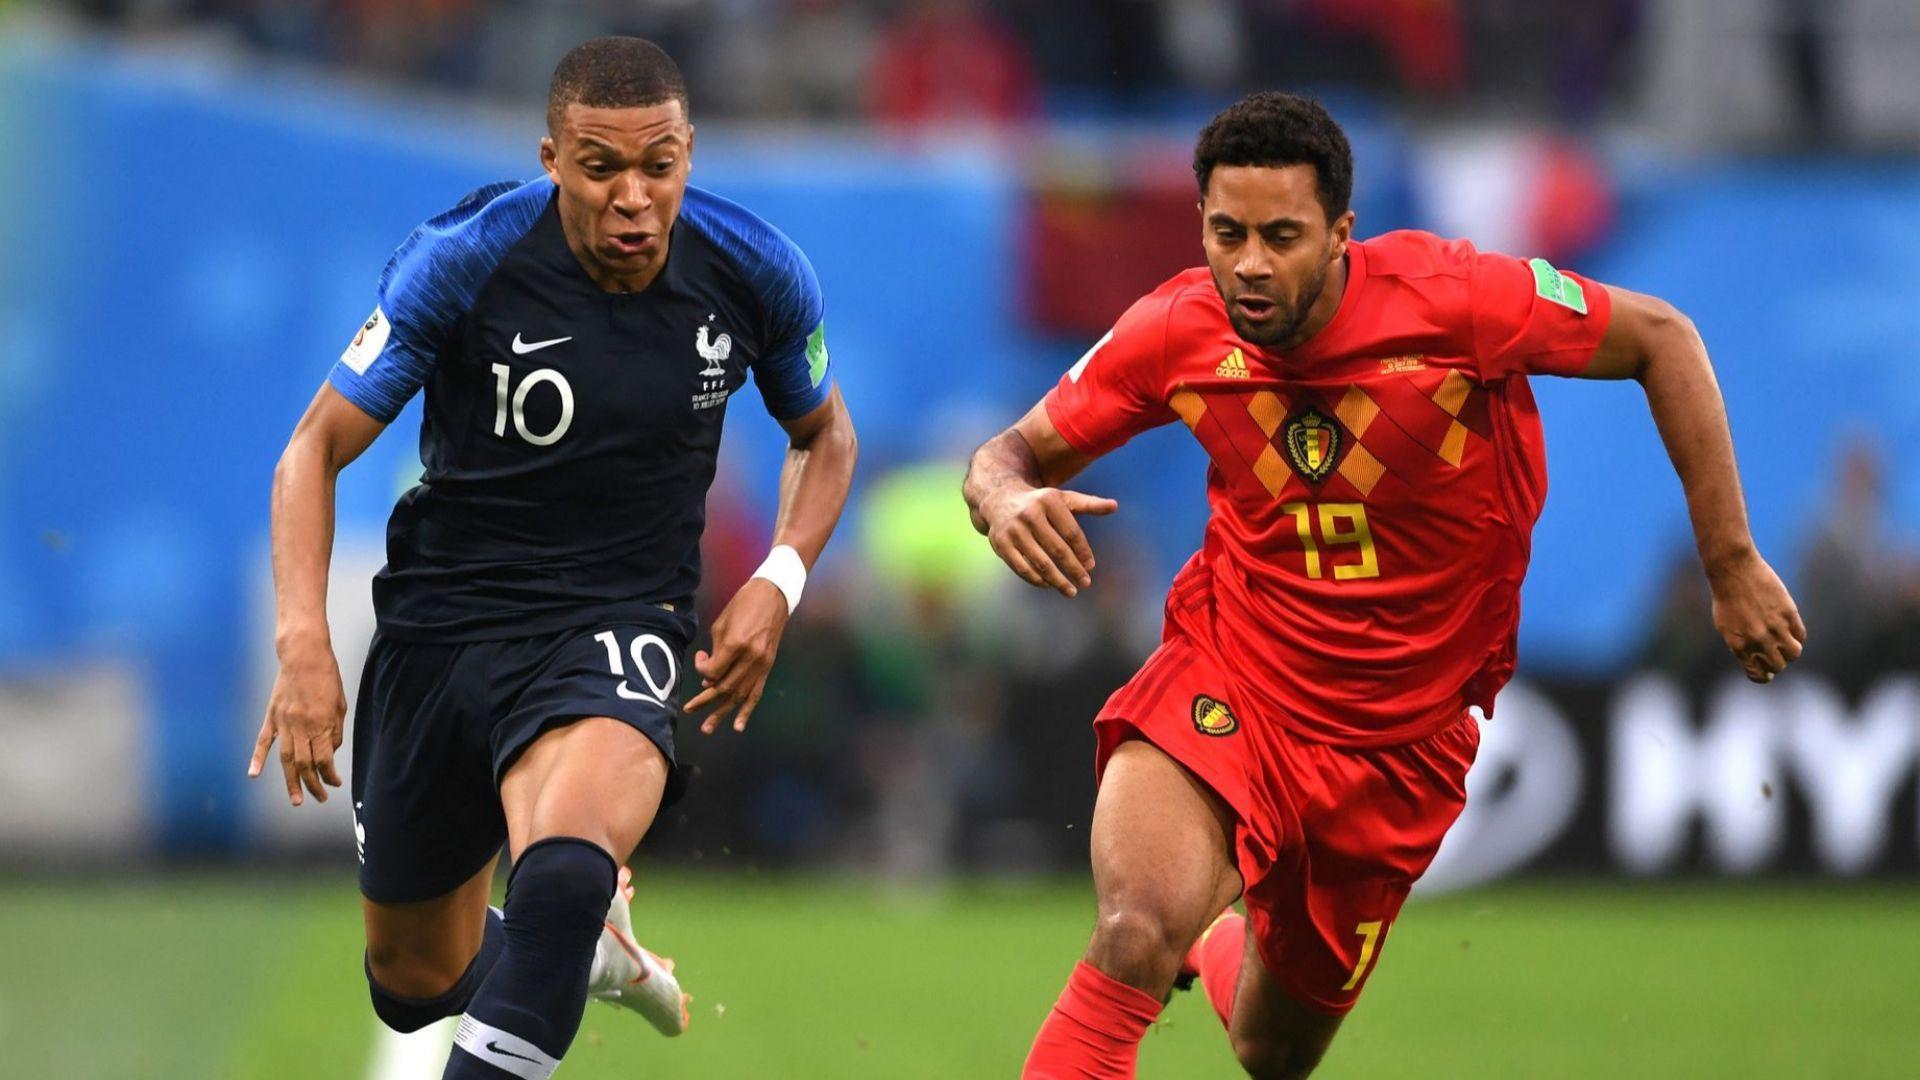 Франция - Белгия 1:0 (статистики)